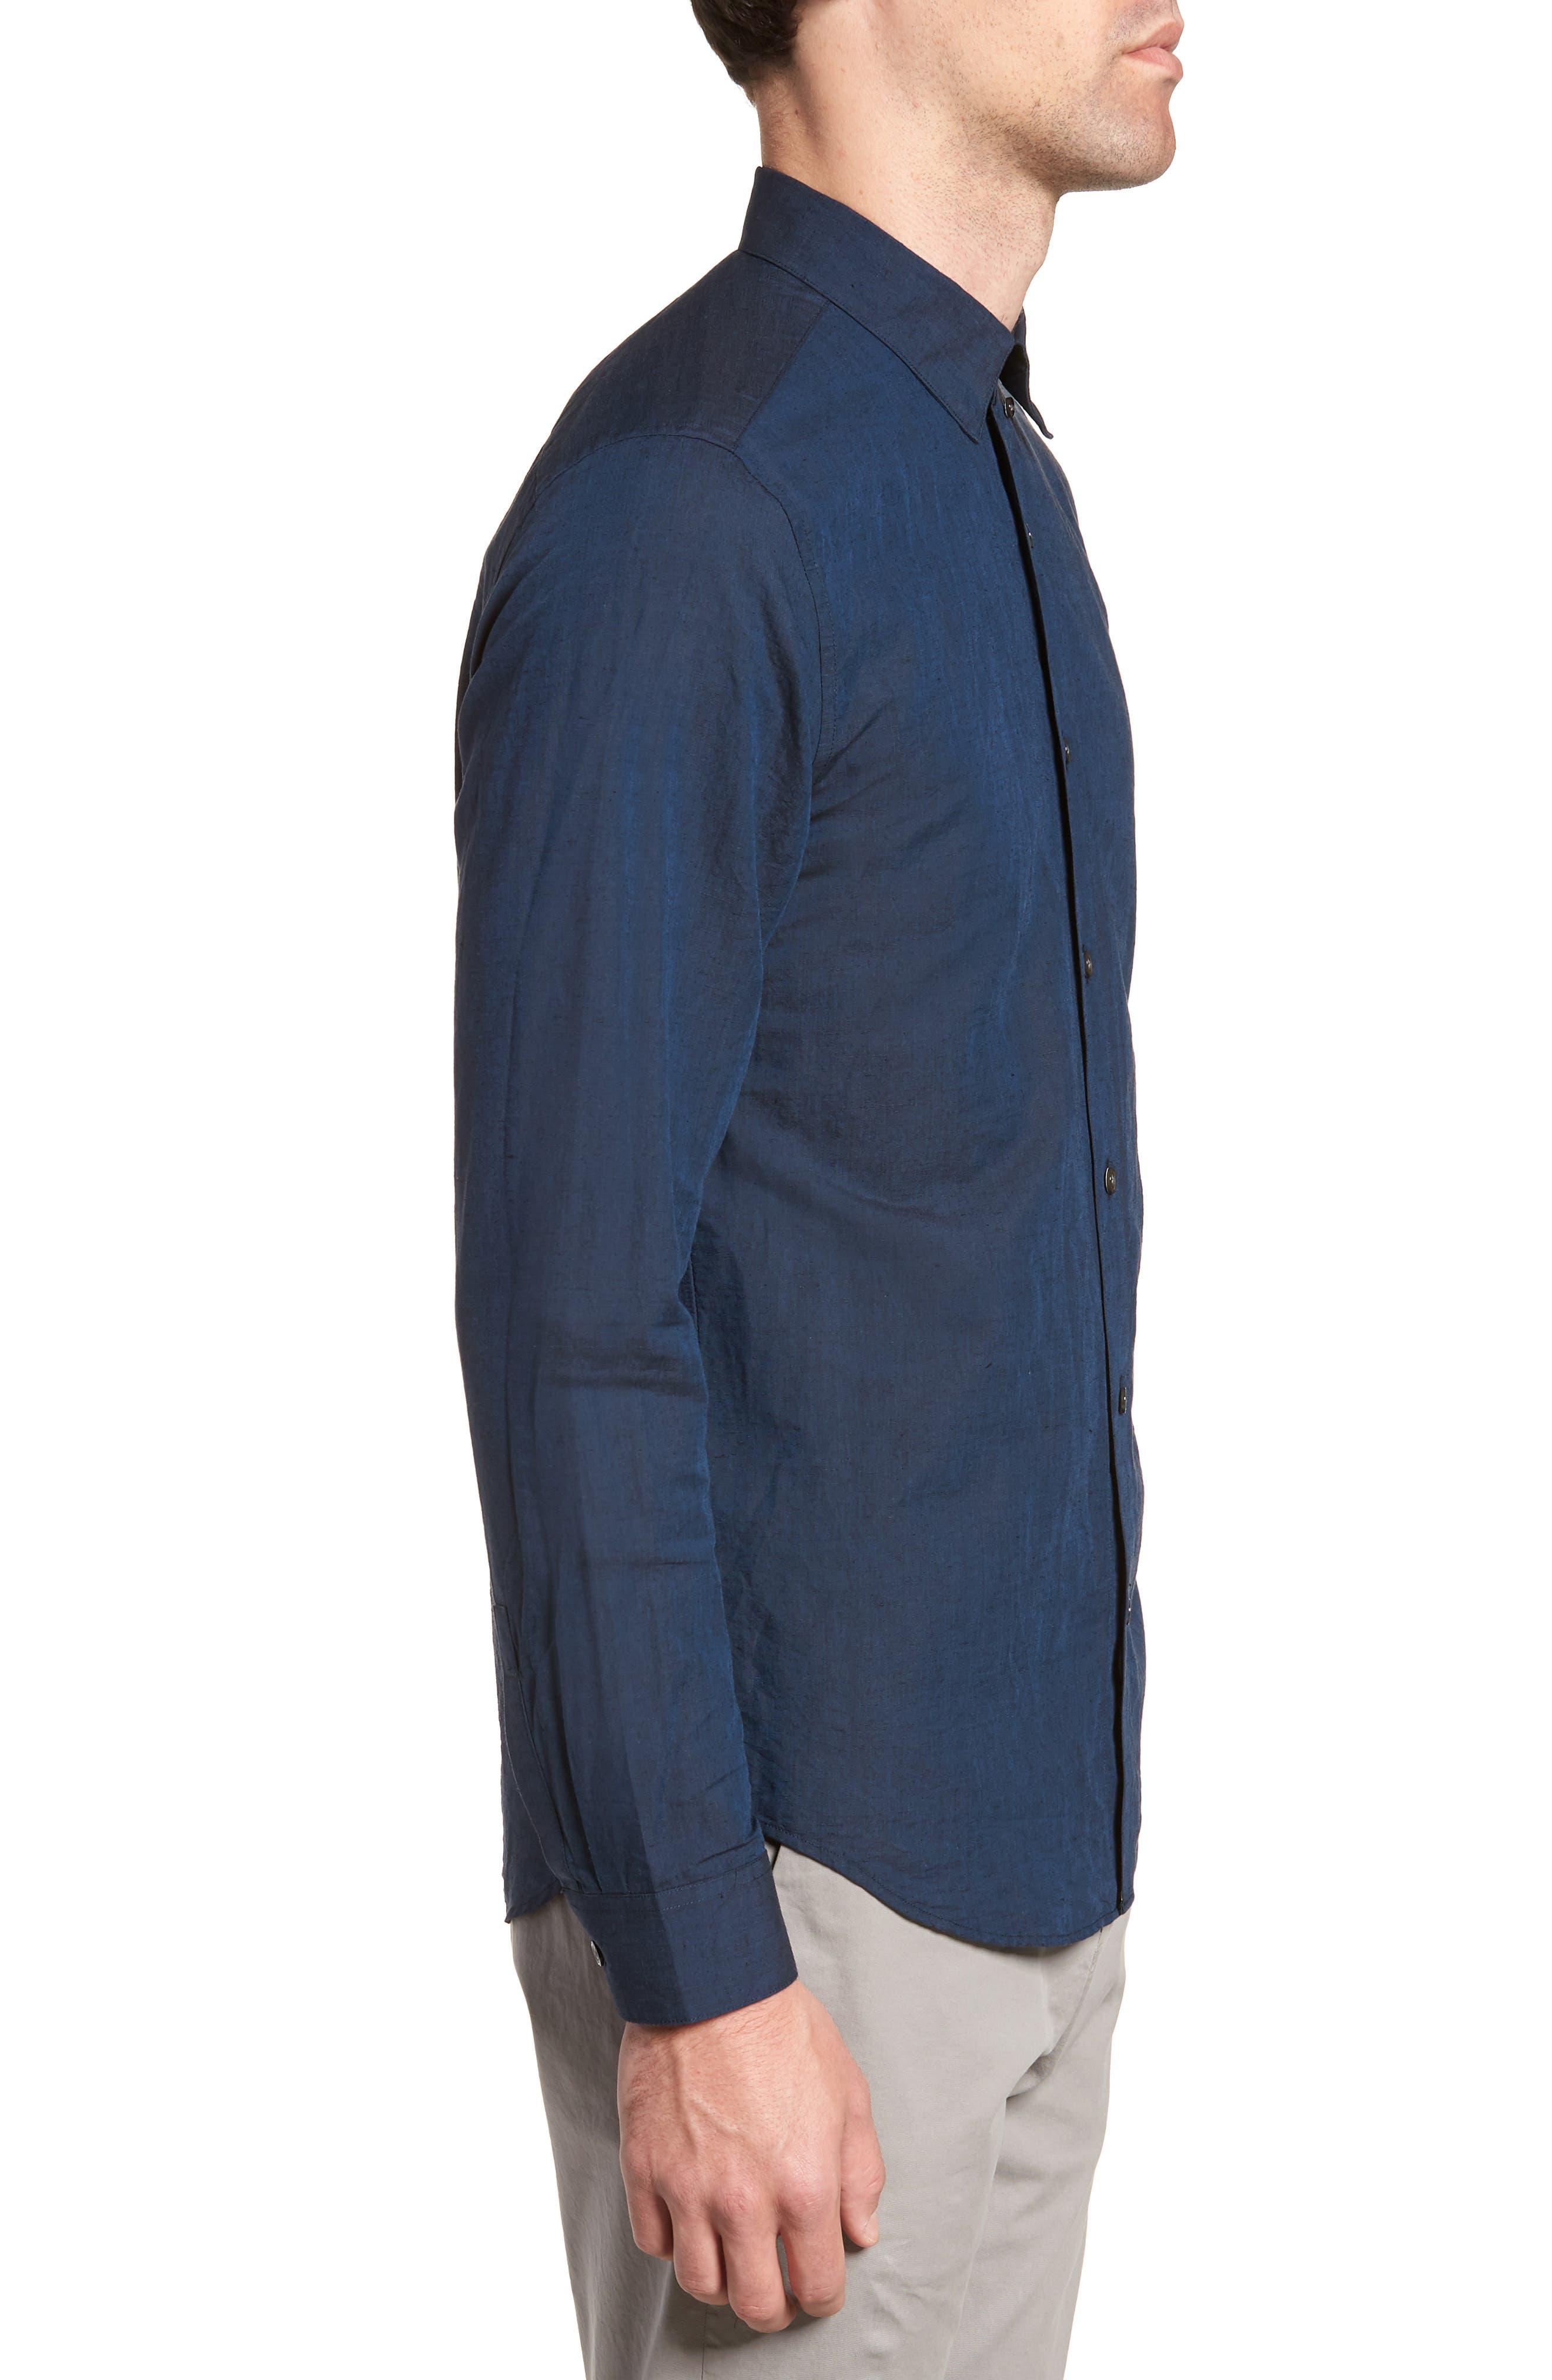 Edward Regular Fit Linen & Cotton Sport Shirt,                             Alternate thumbnail 3, color,                             Finch